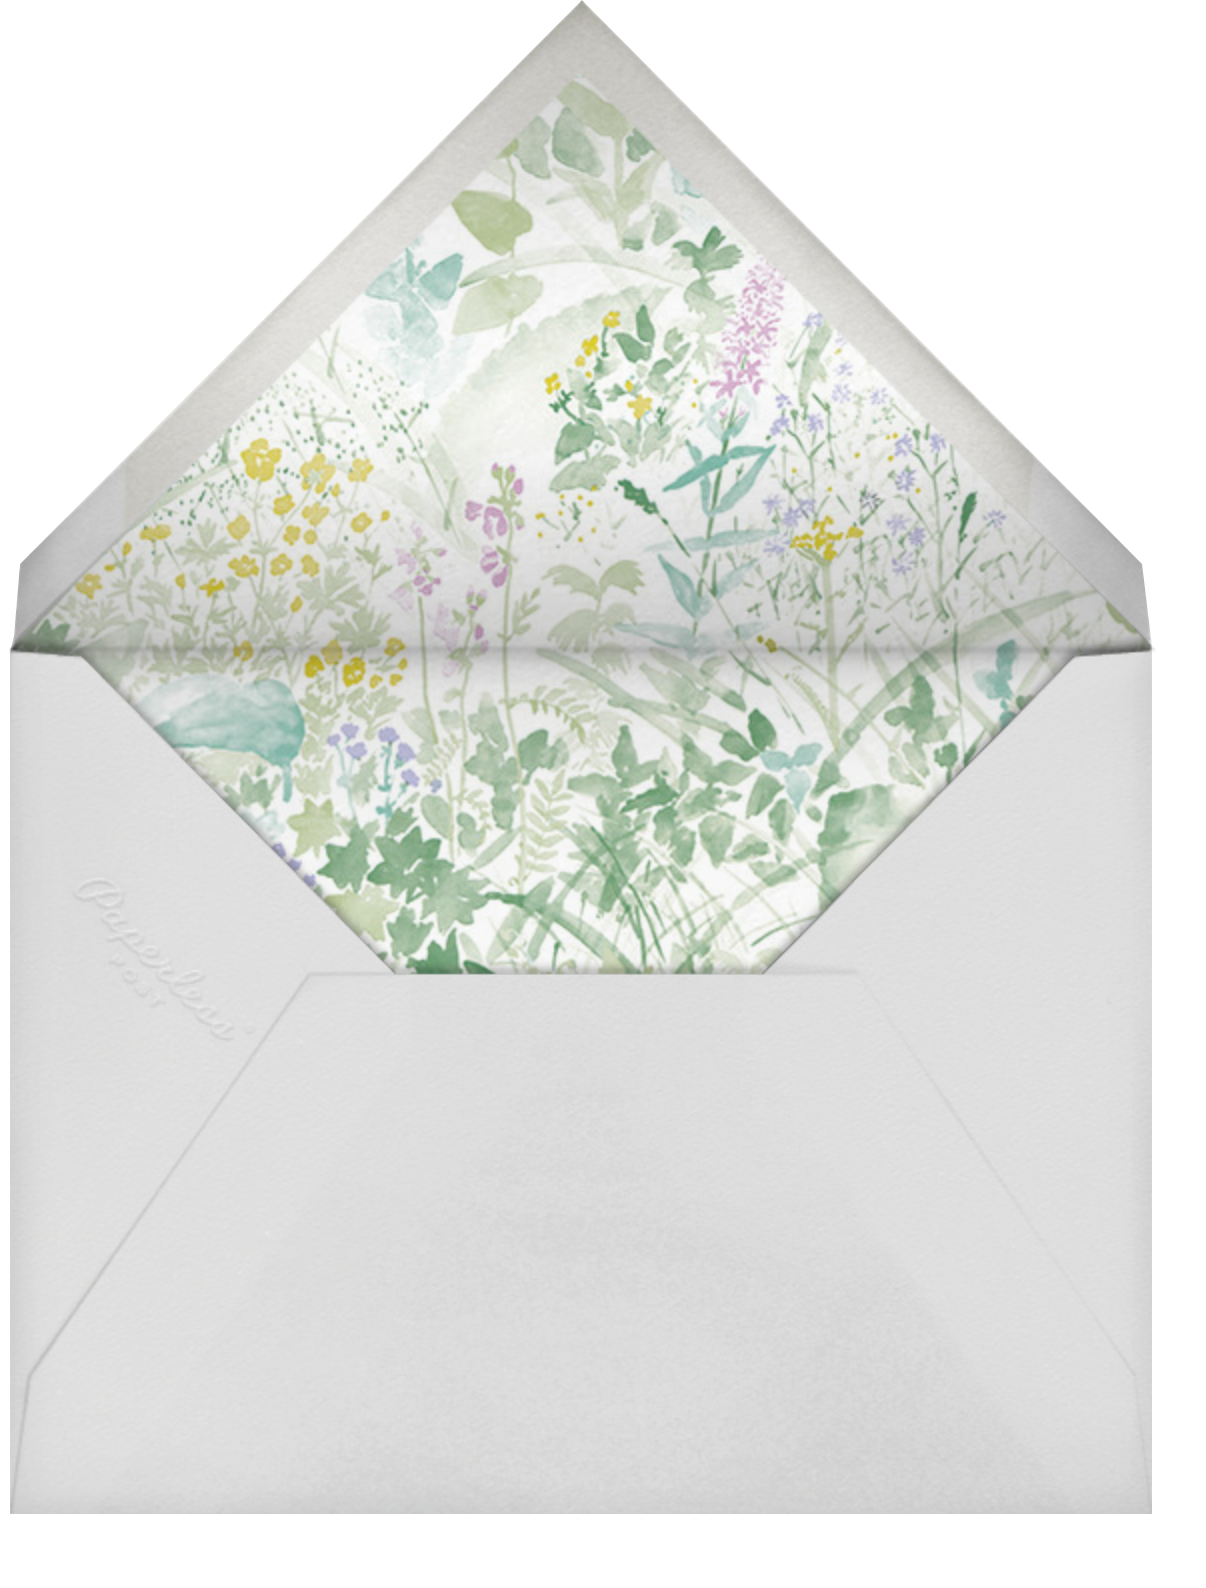 Kesanto (Tall) - Marimekko - Spring entertaining - envelope back